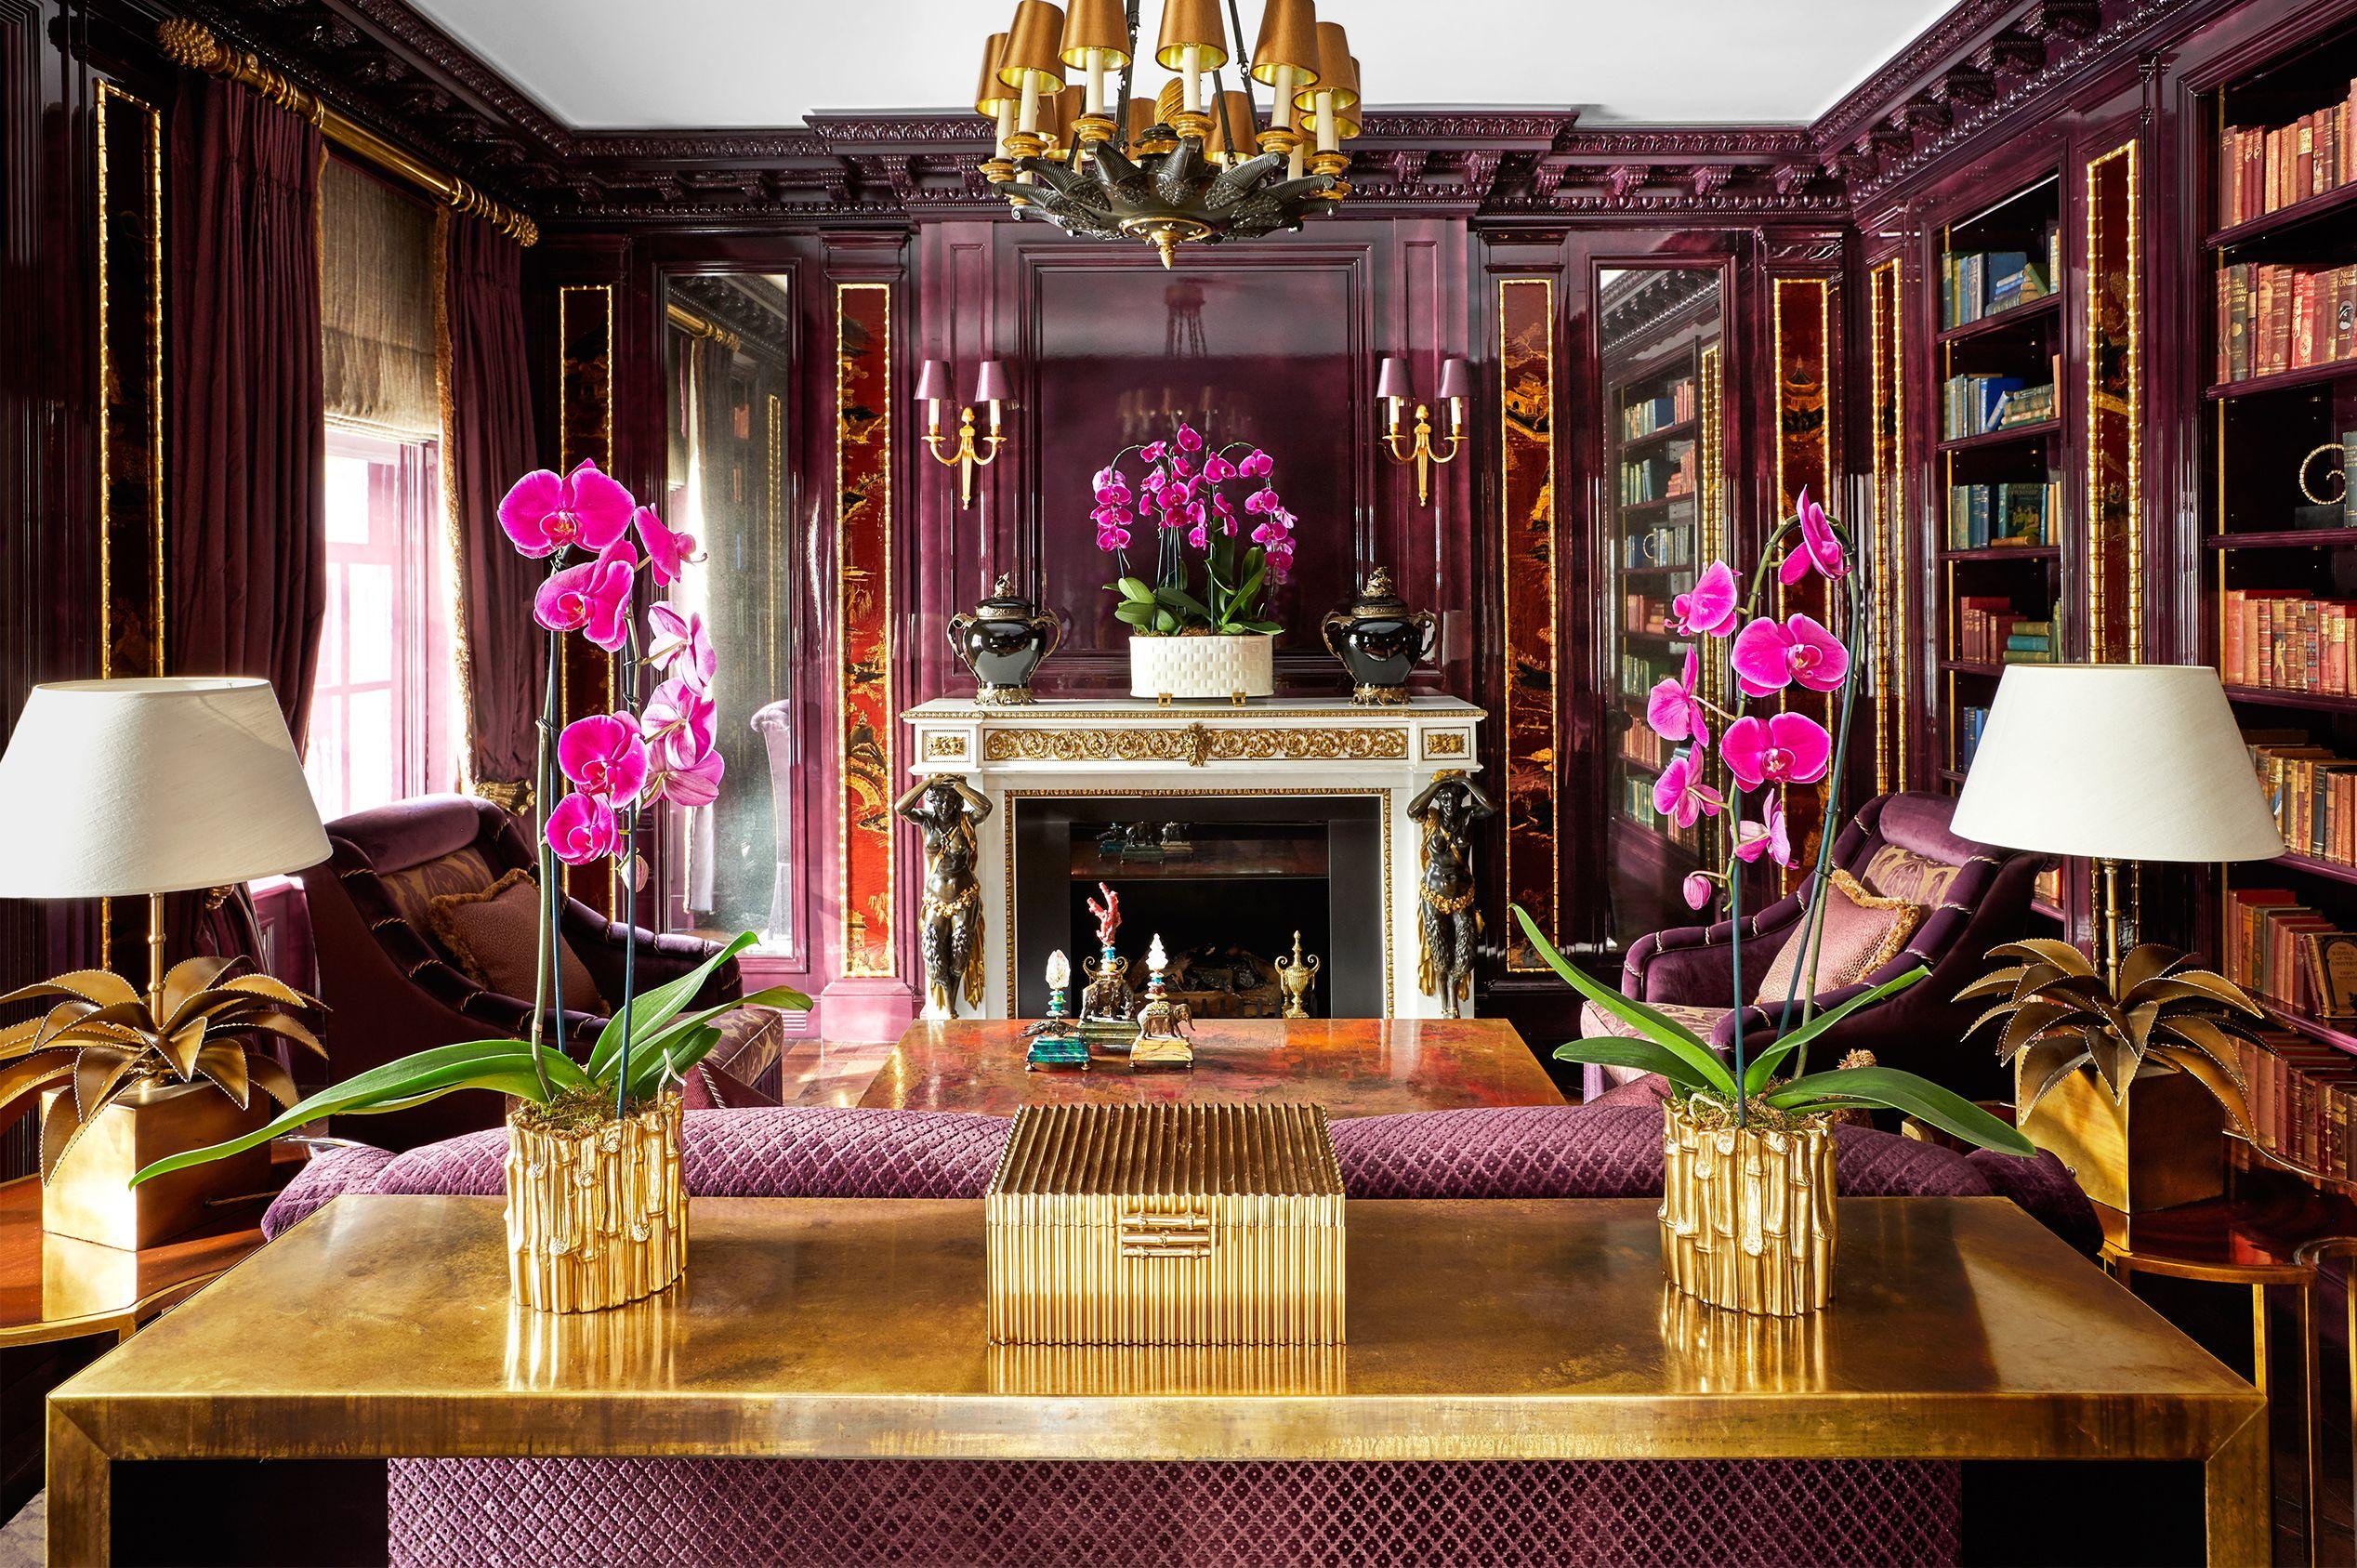 Designer Philip Vergeylen Transforms a 25,000-Square-Foot New Home in London